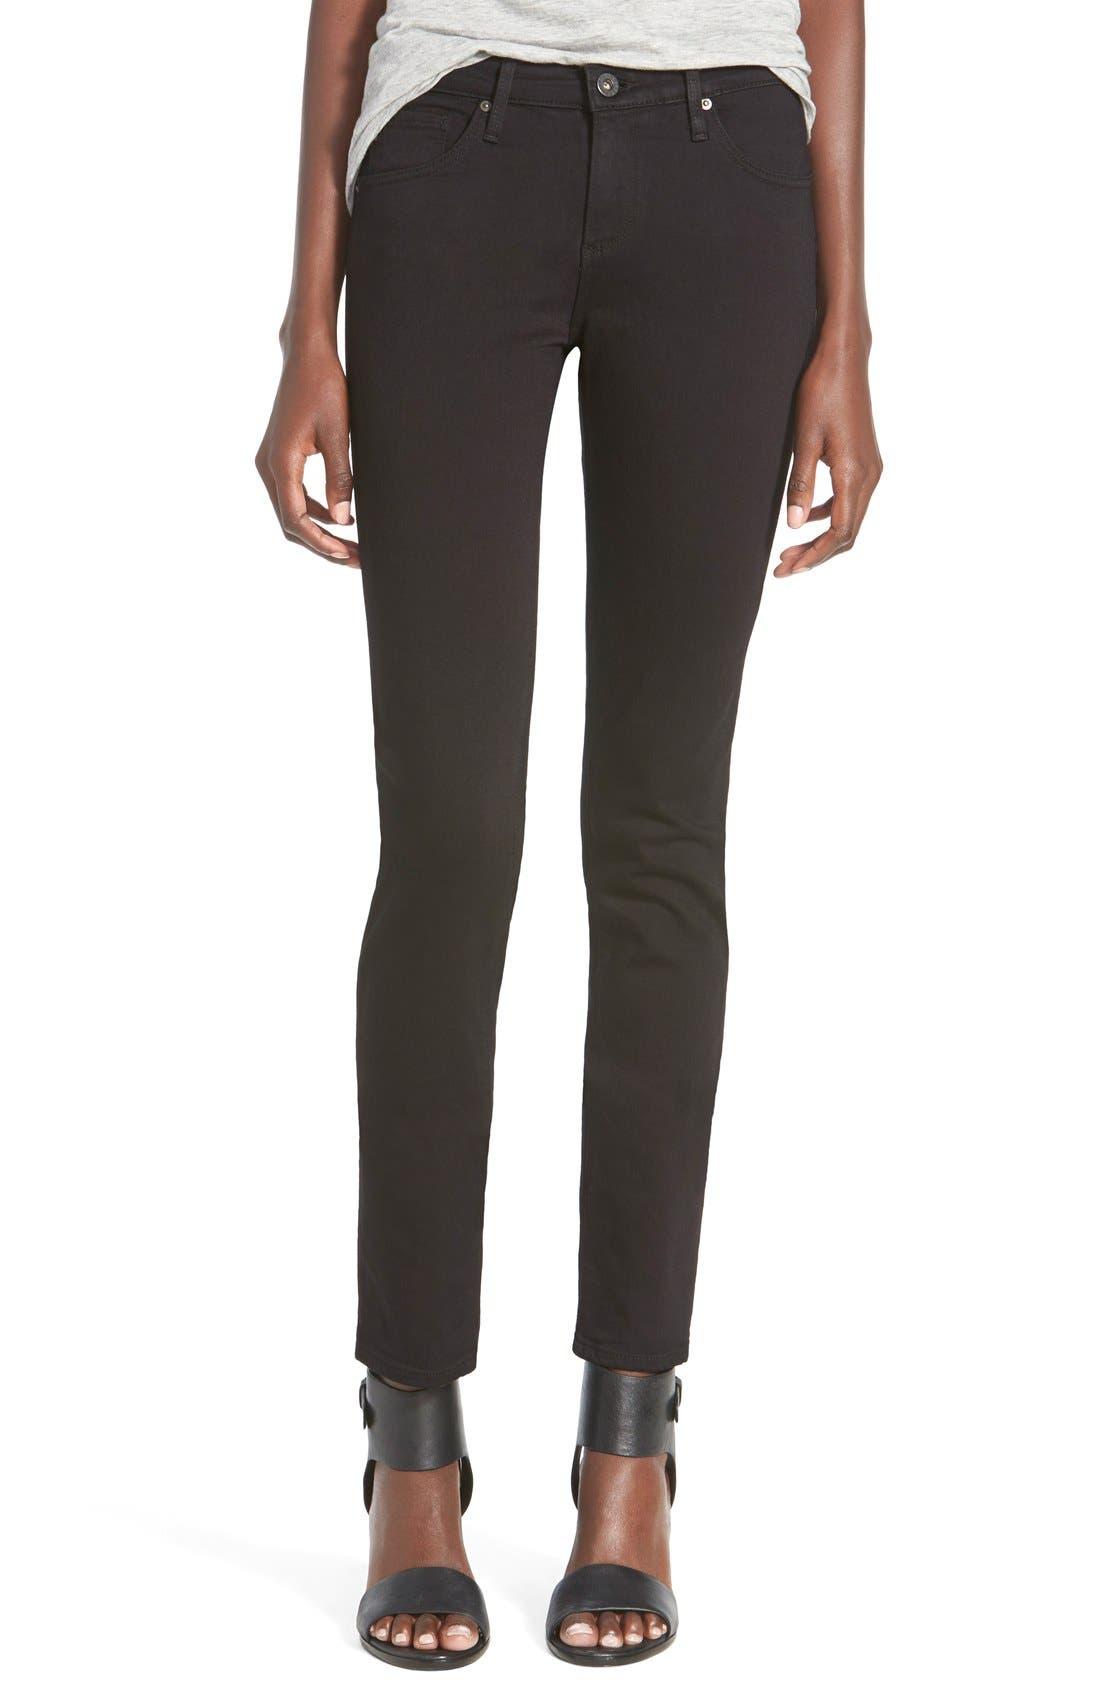 Alternate Image 1 Selected - AG 'Stilt Cigarette' Skinny Jeans (Super Black)